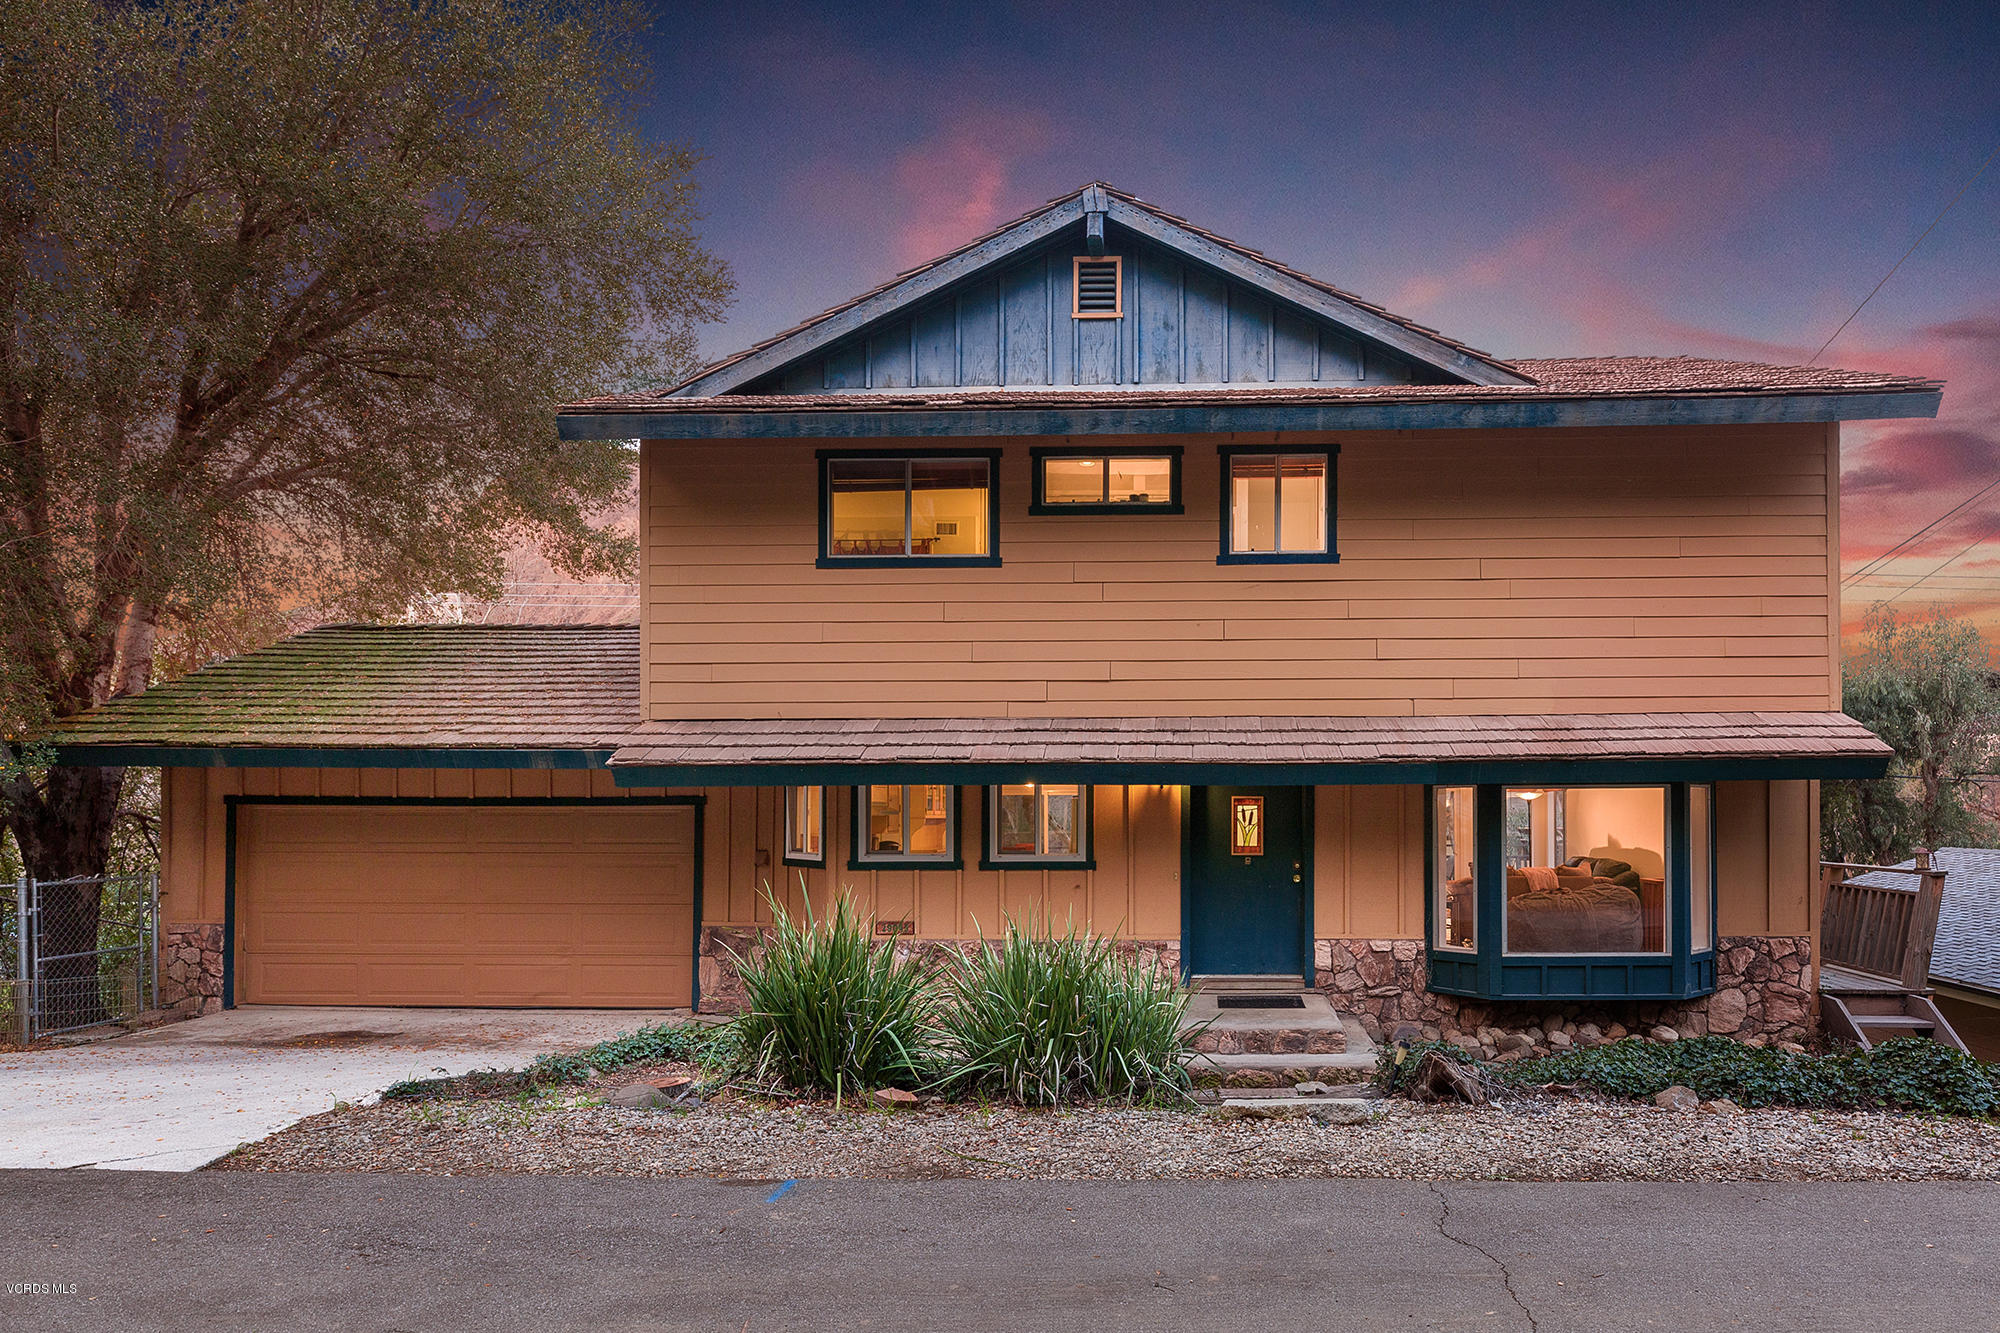 29043 Lake Drive, Agoura Hills, CA 91301